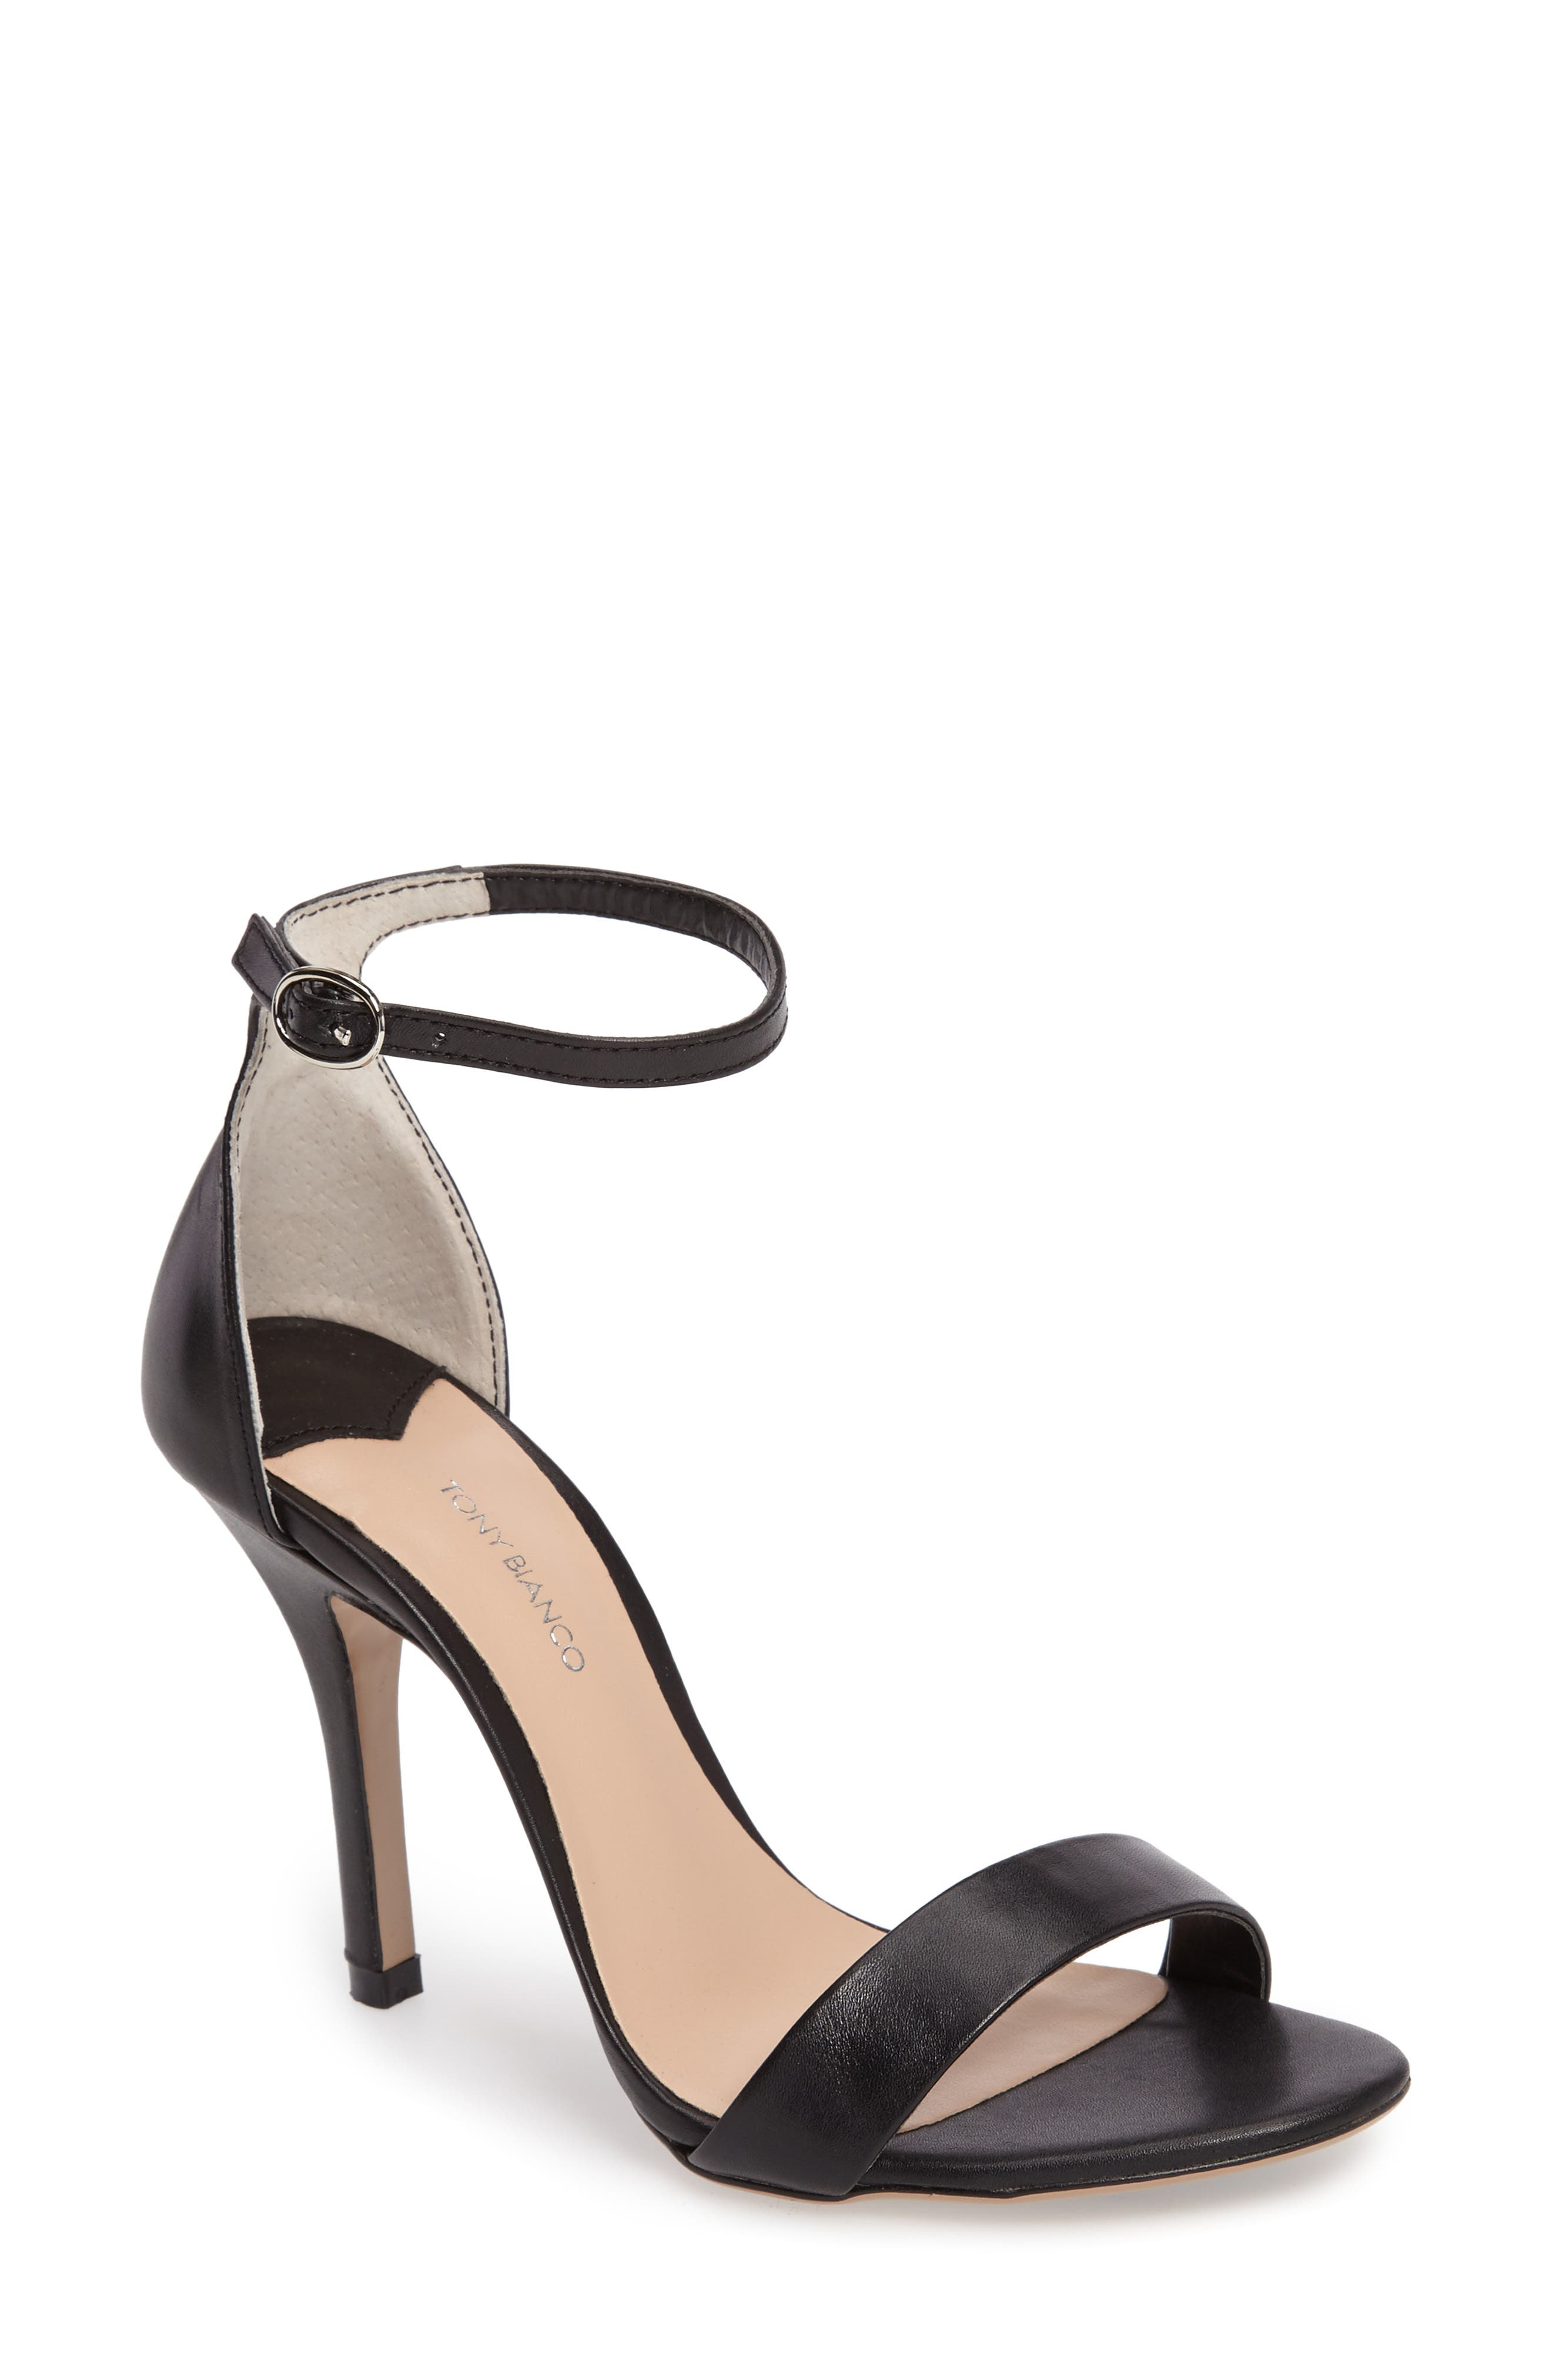 Alternate Image 1 Selected - Tony Bianco Lovinia Strappy Sandal (Women)